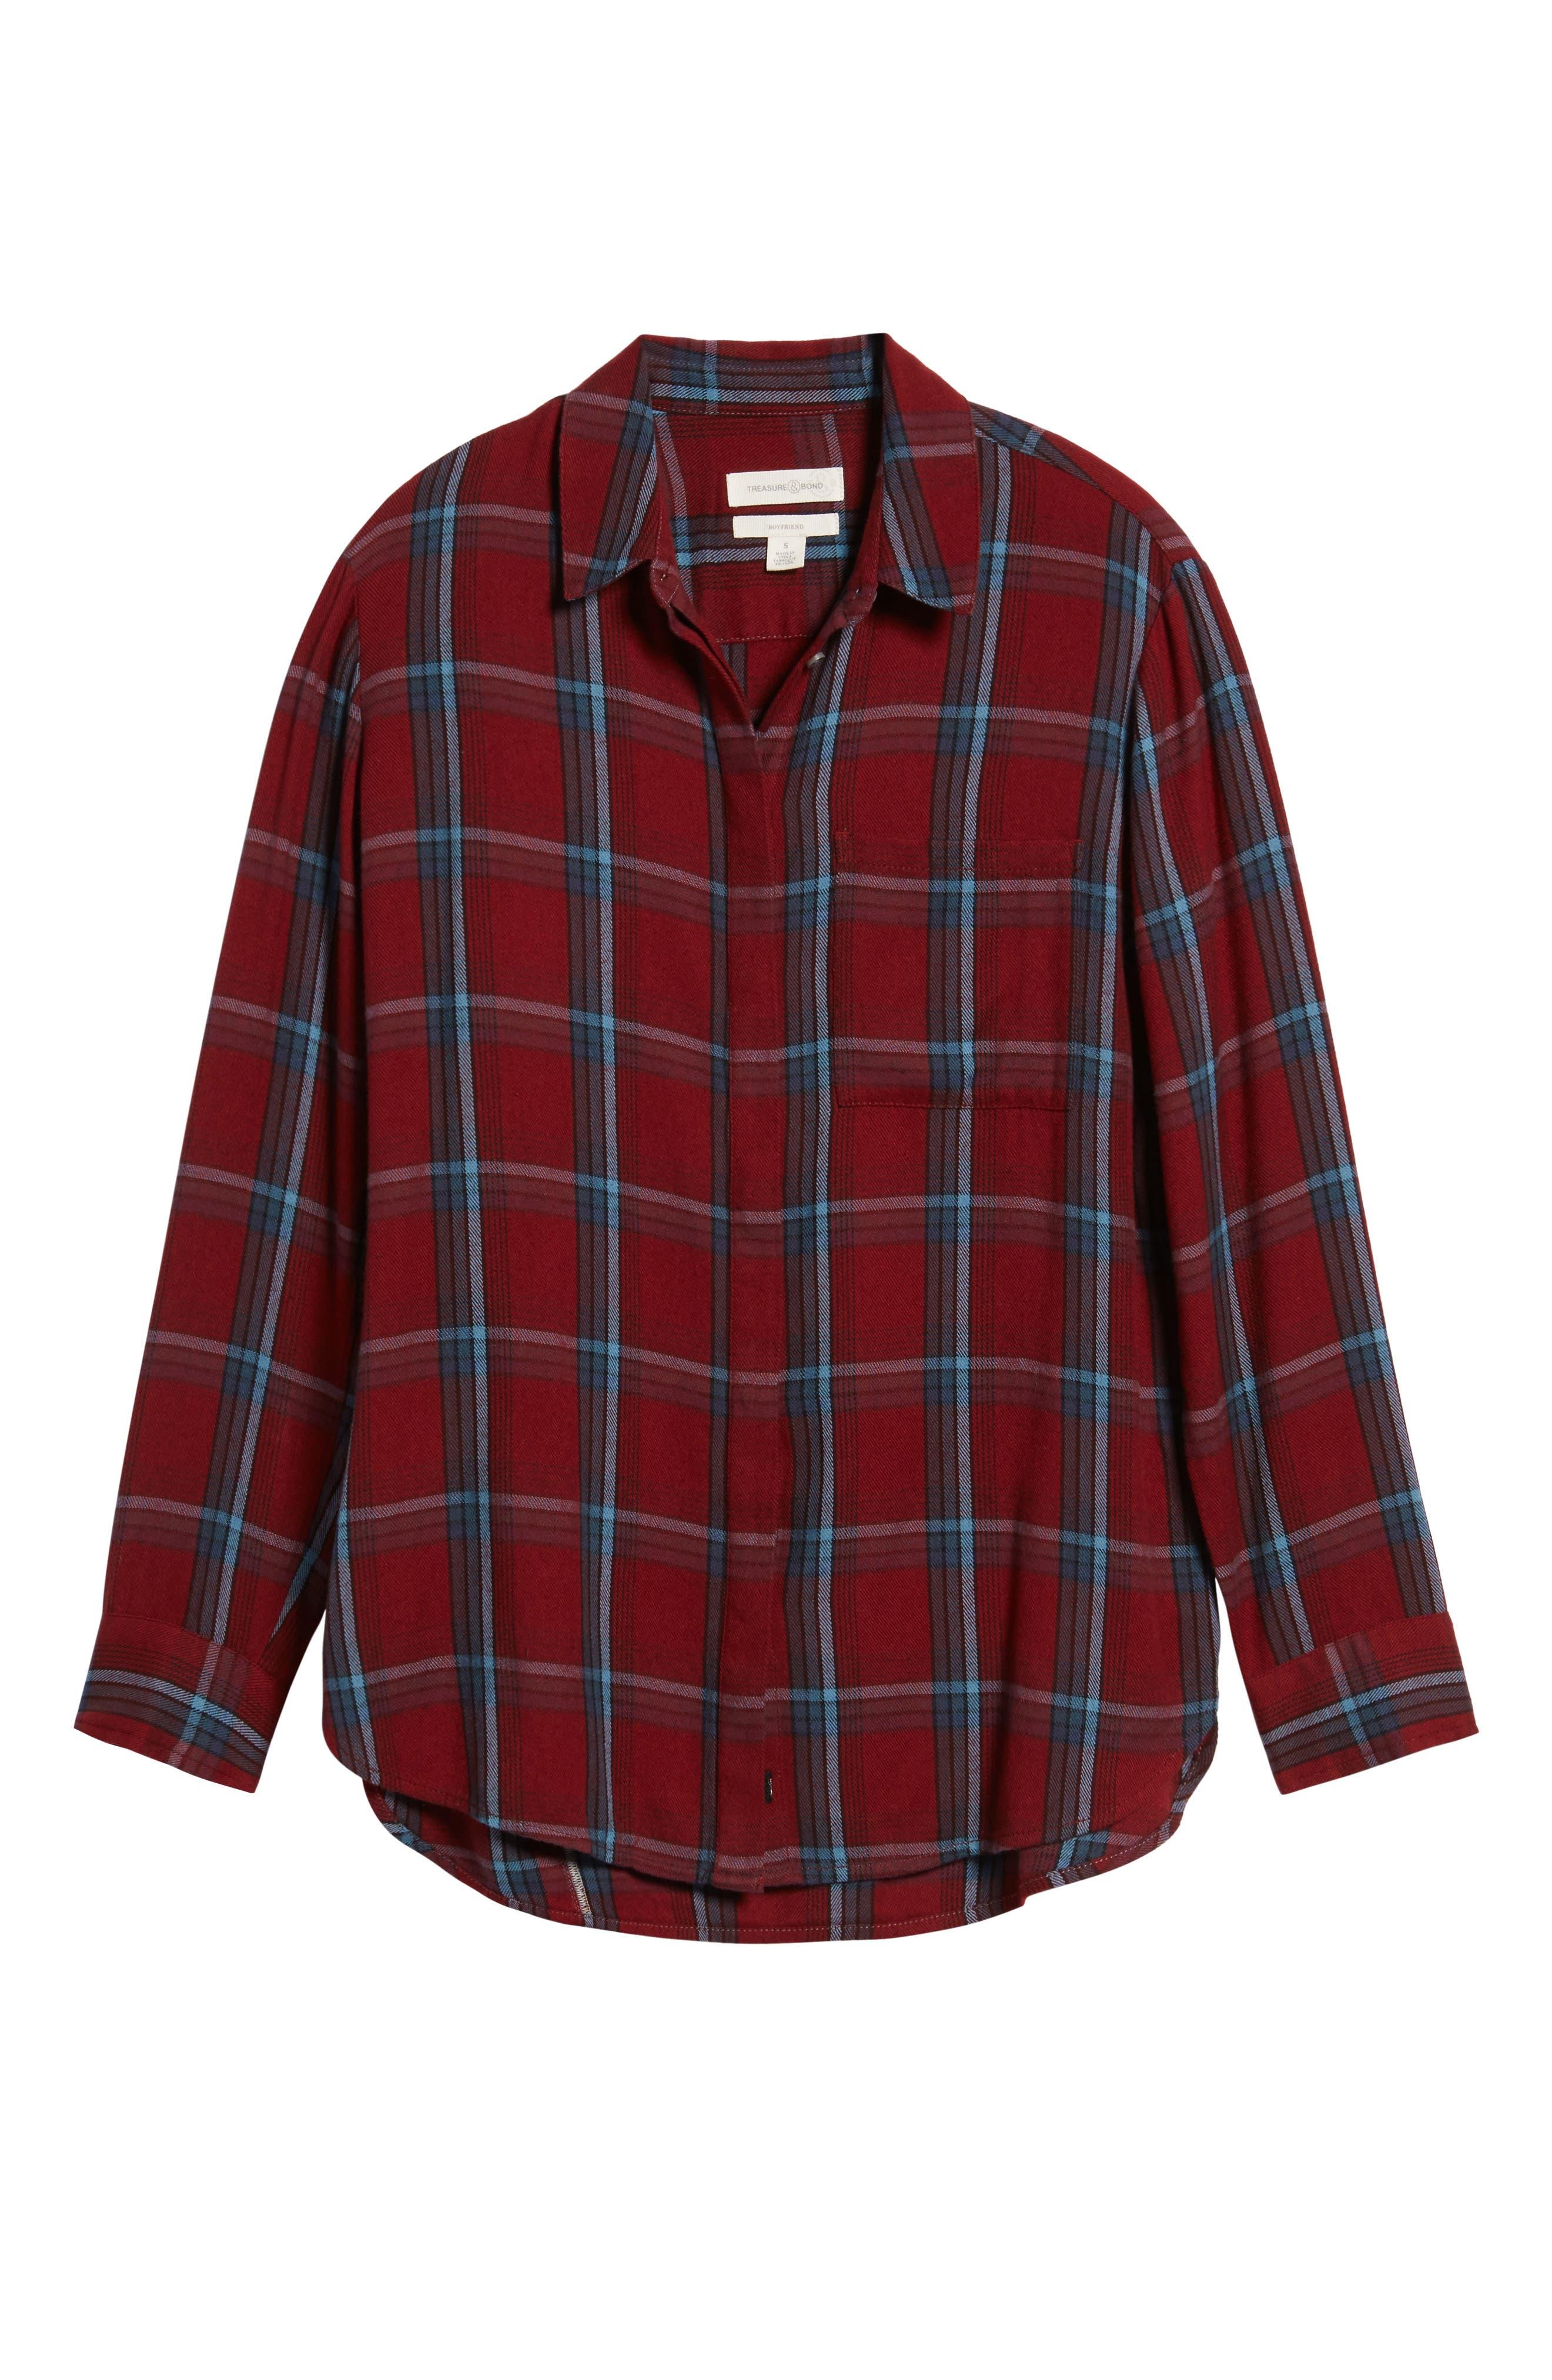 Ruffle Plaid Boyfriend Shirt,                             Alternate thumbnail 6, color,                             Red Syrah Three Box Tartan